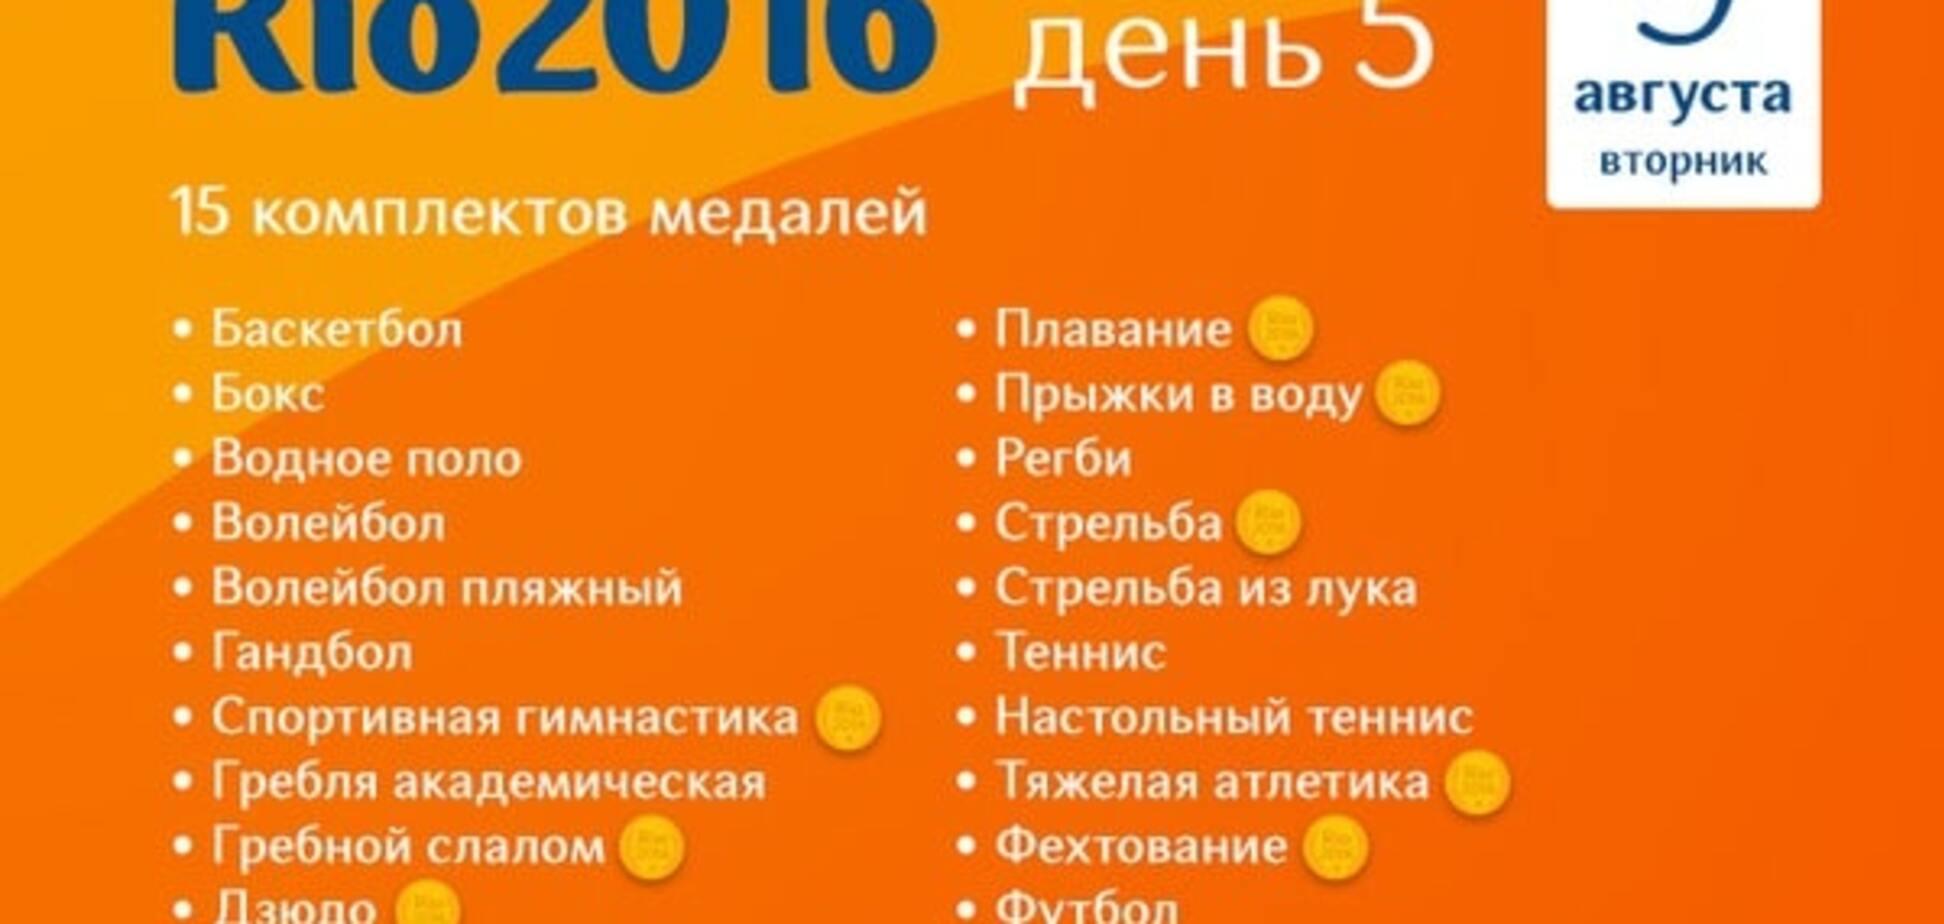 Олимпиада 2016 календарь